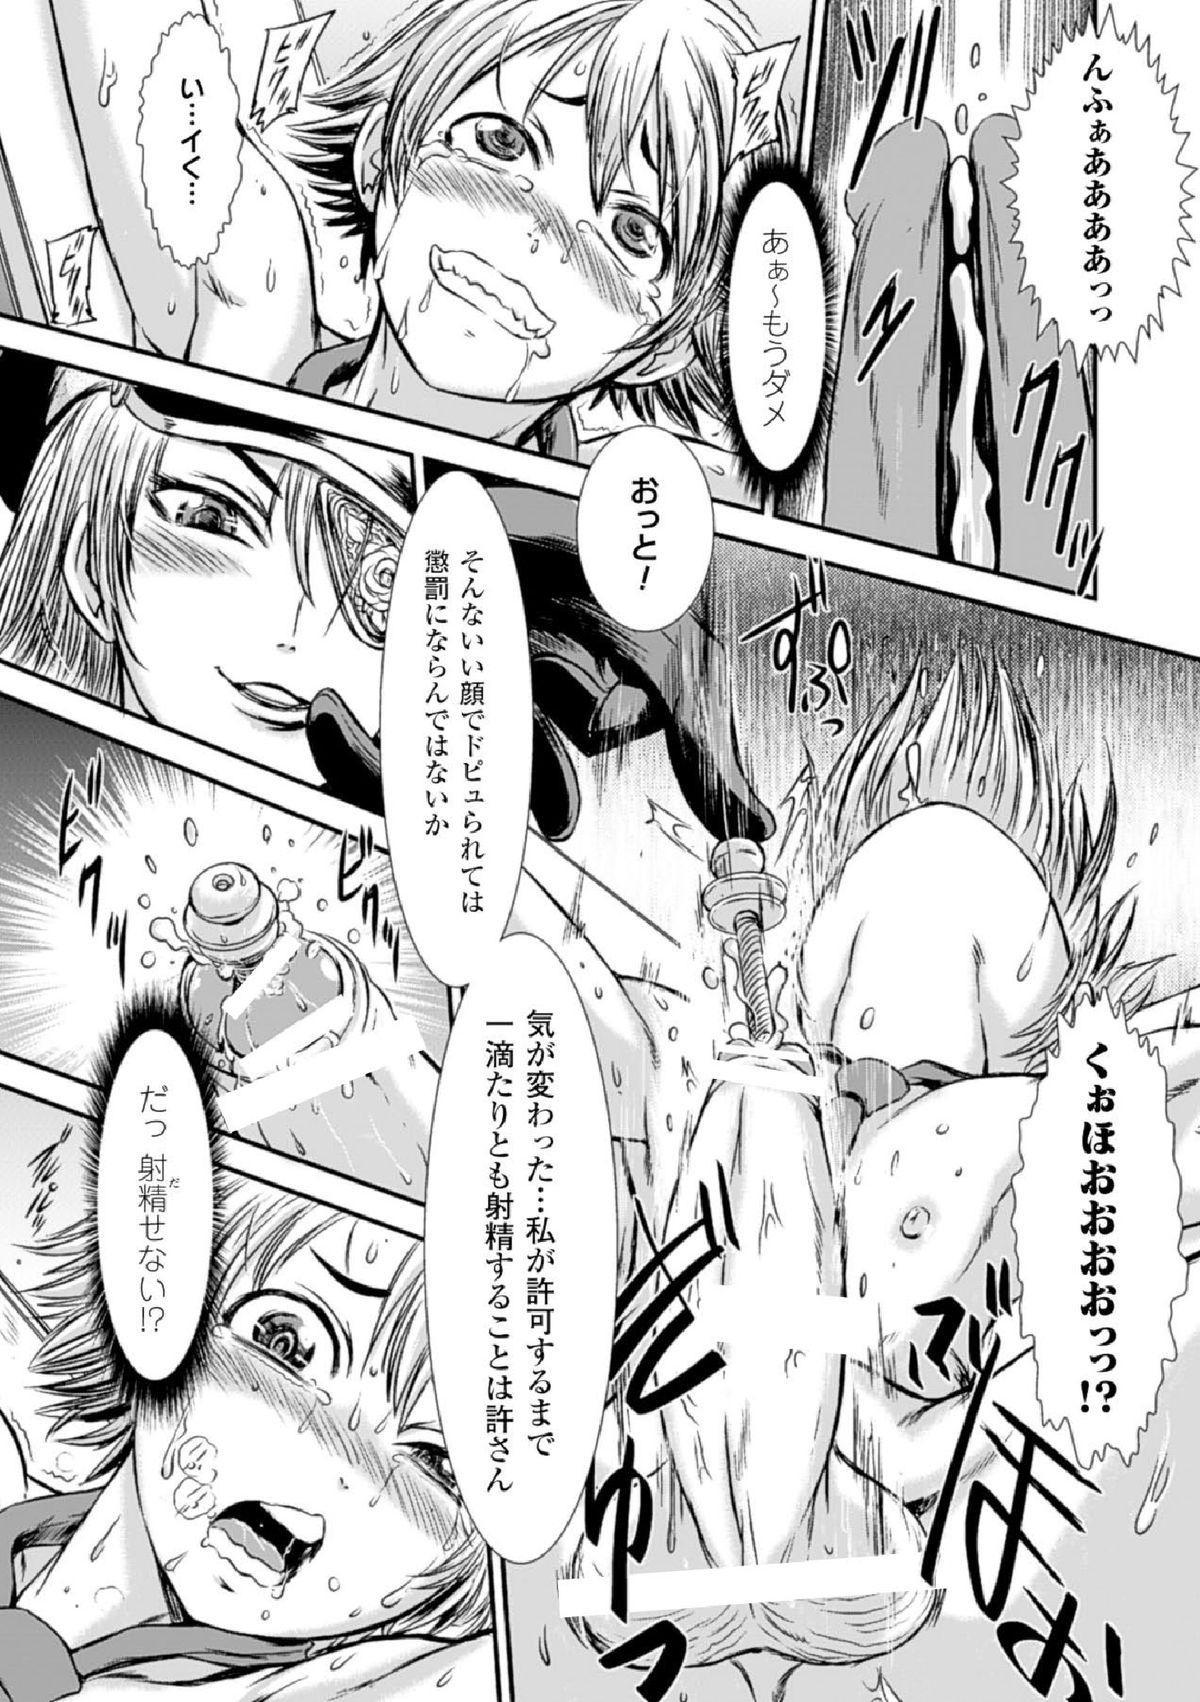 Haiboku Heroine Kaizou Choukyou Inferno 164